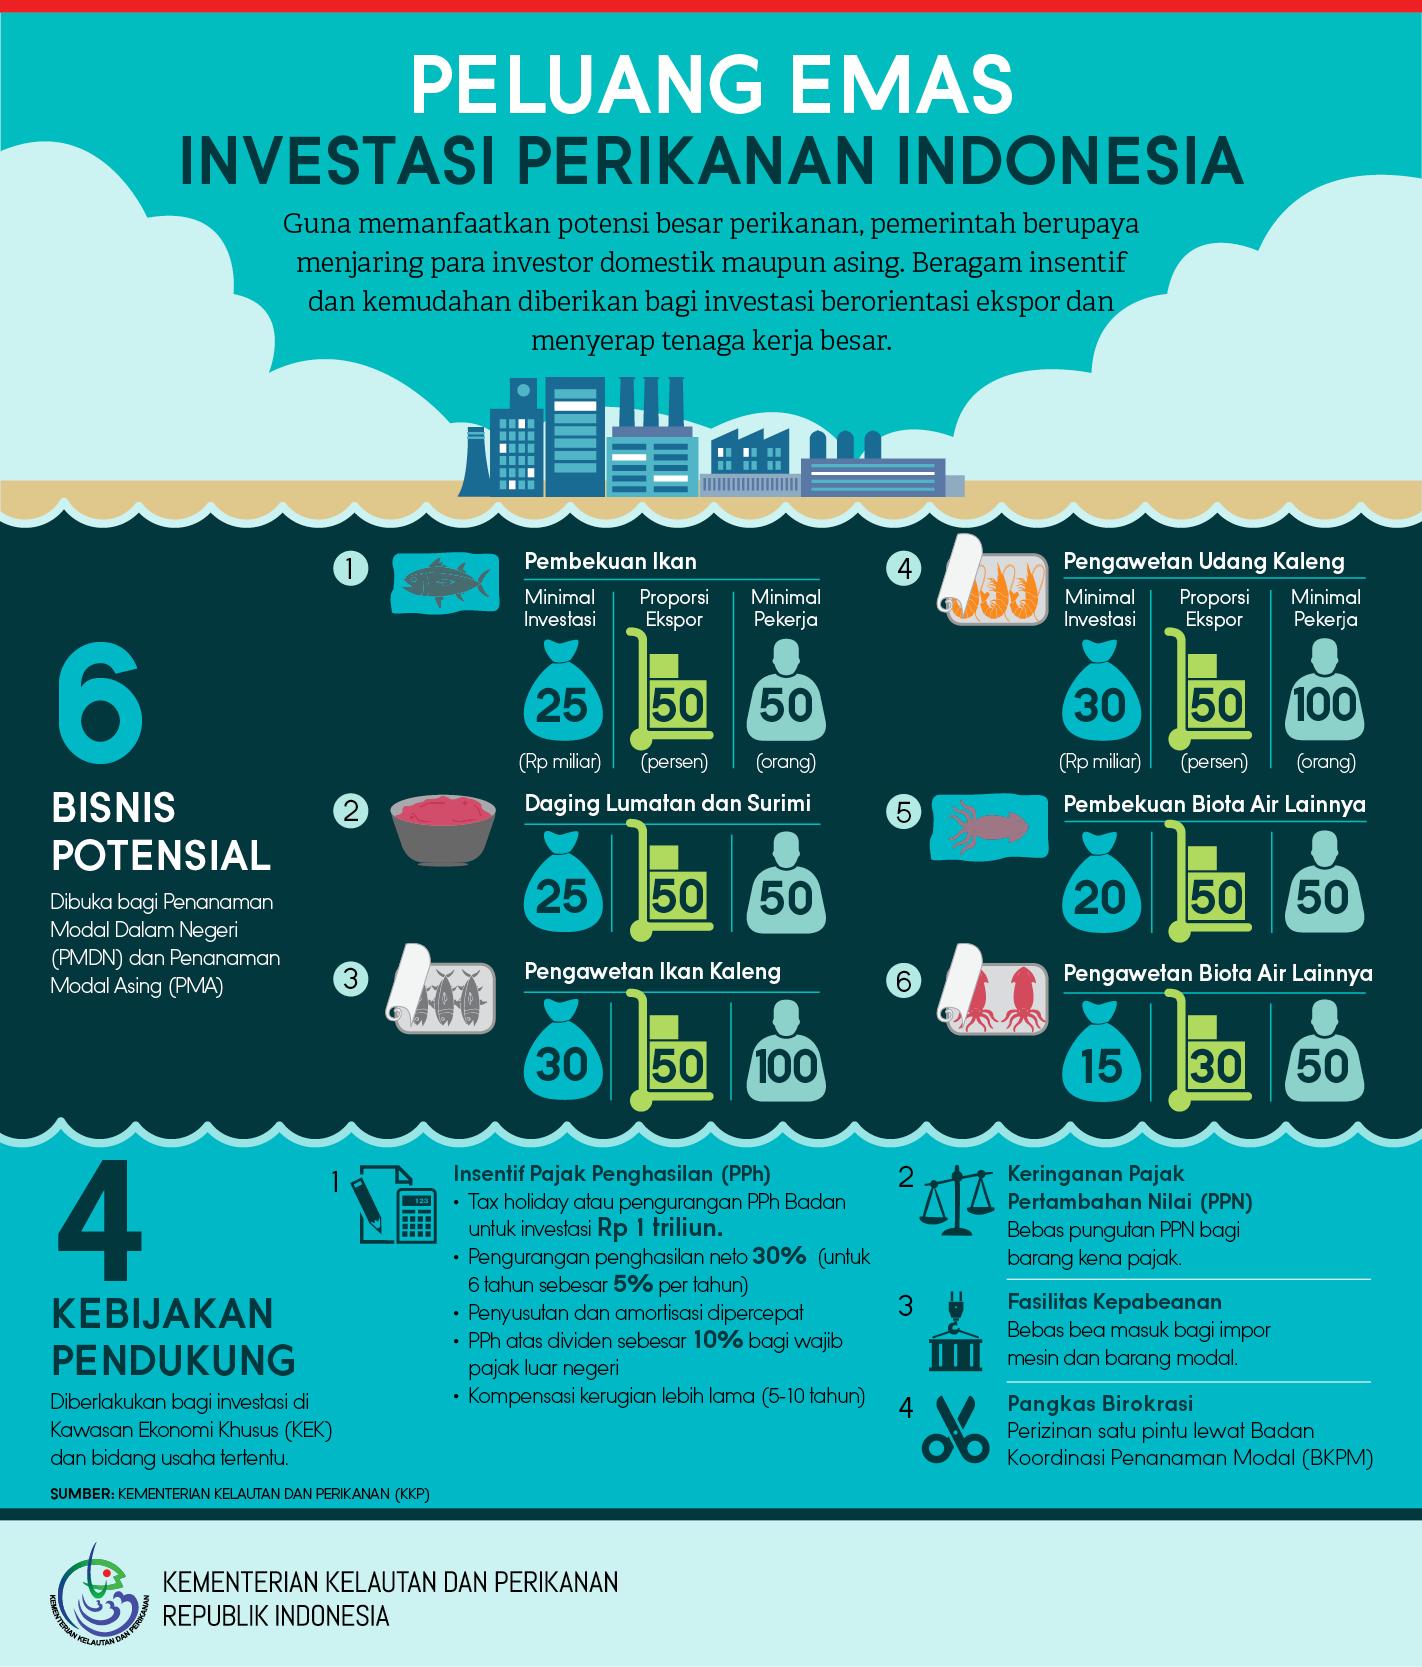 Peluang Emas Investasi Perikanan Indonesia